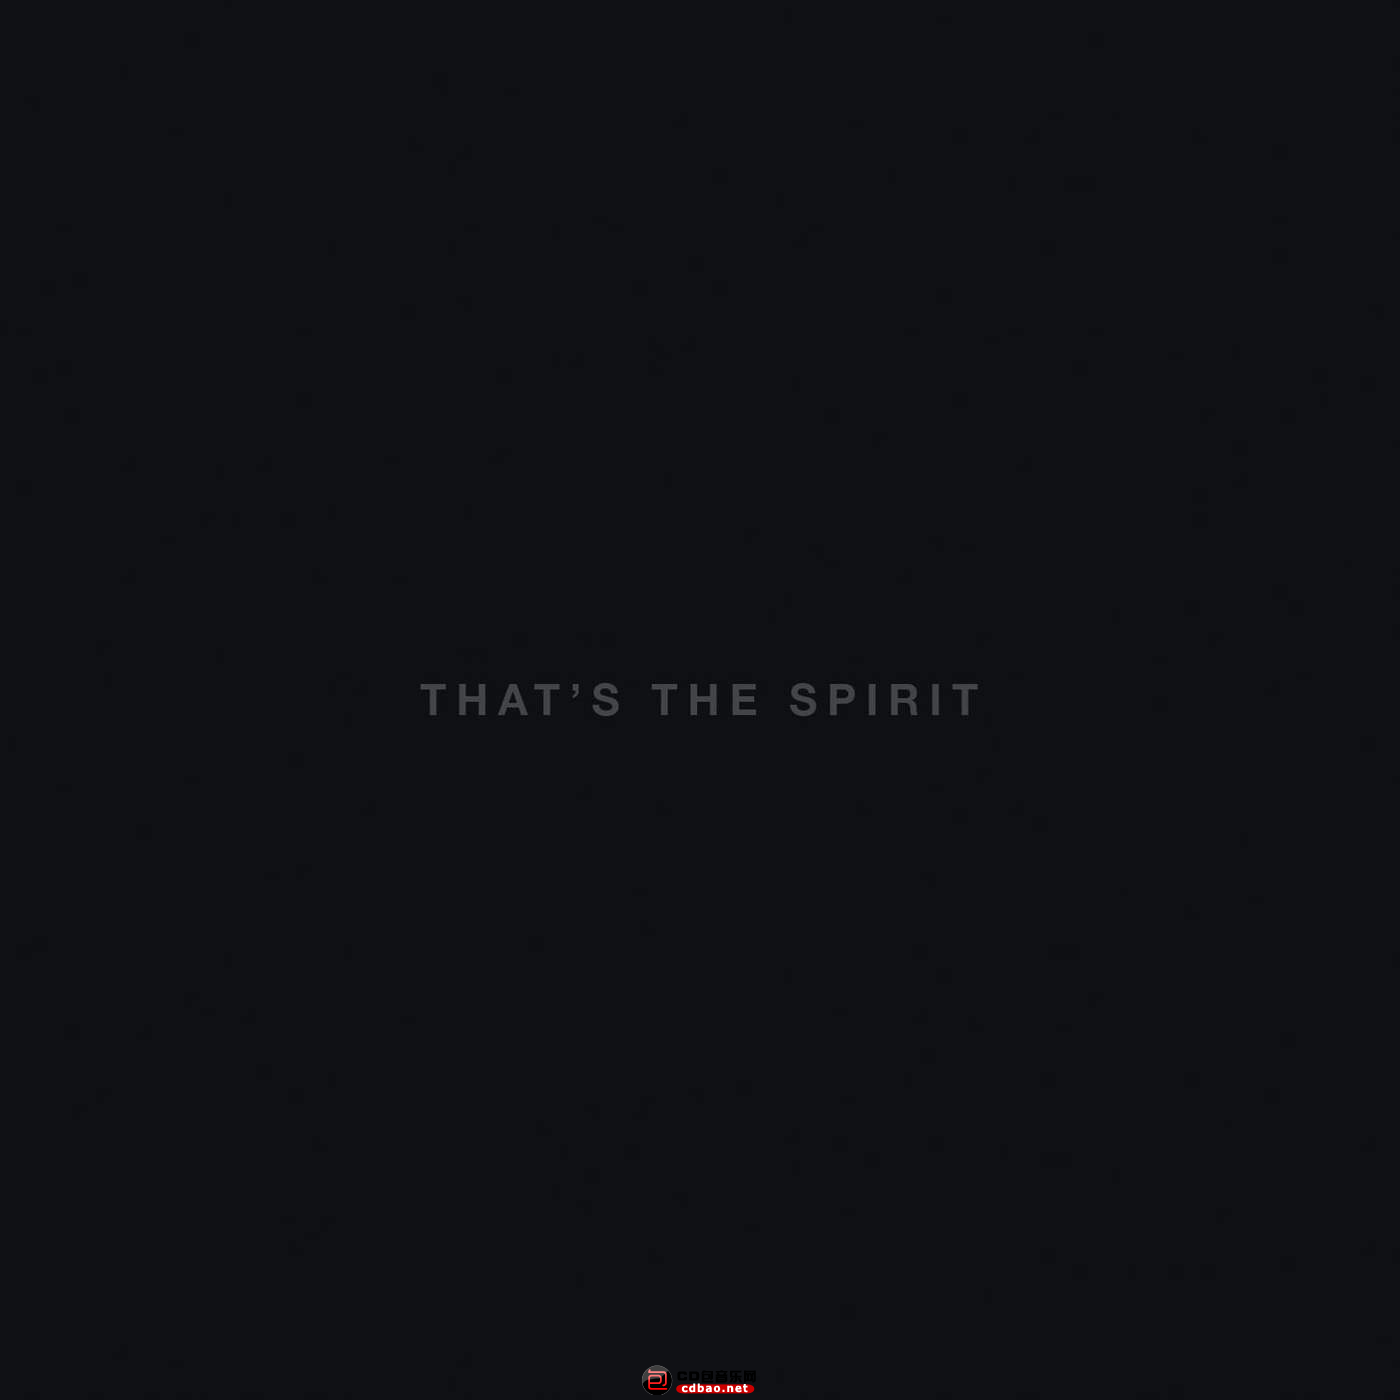 Bring-Me-The-Horizon-Thats-the-Spirit.png